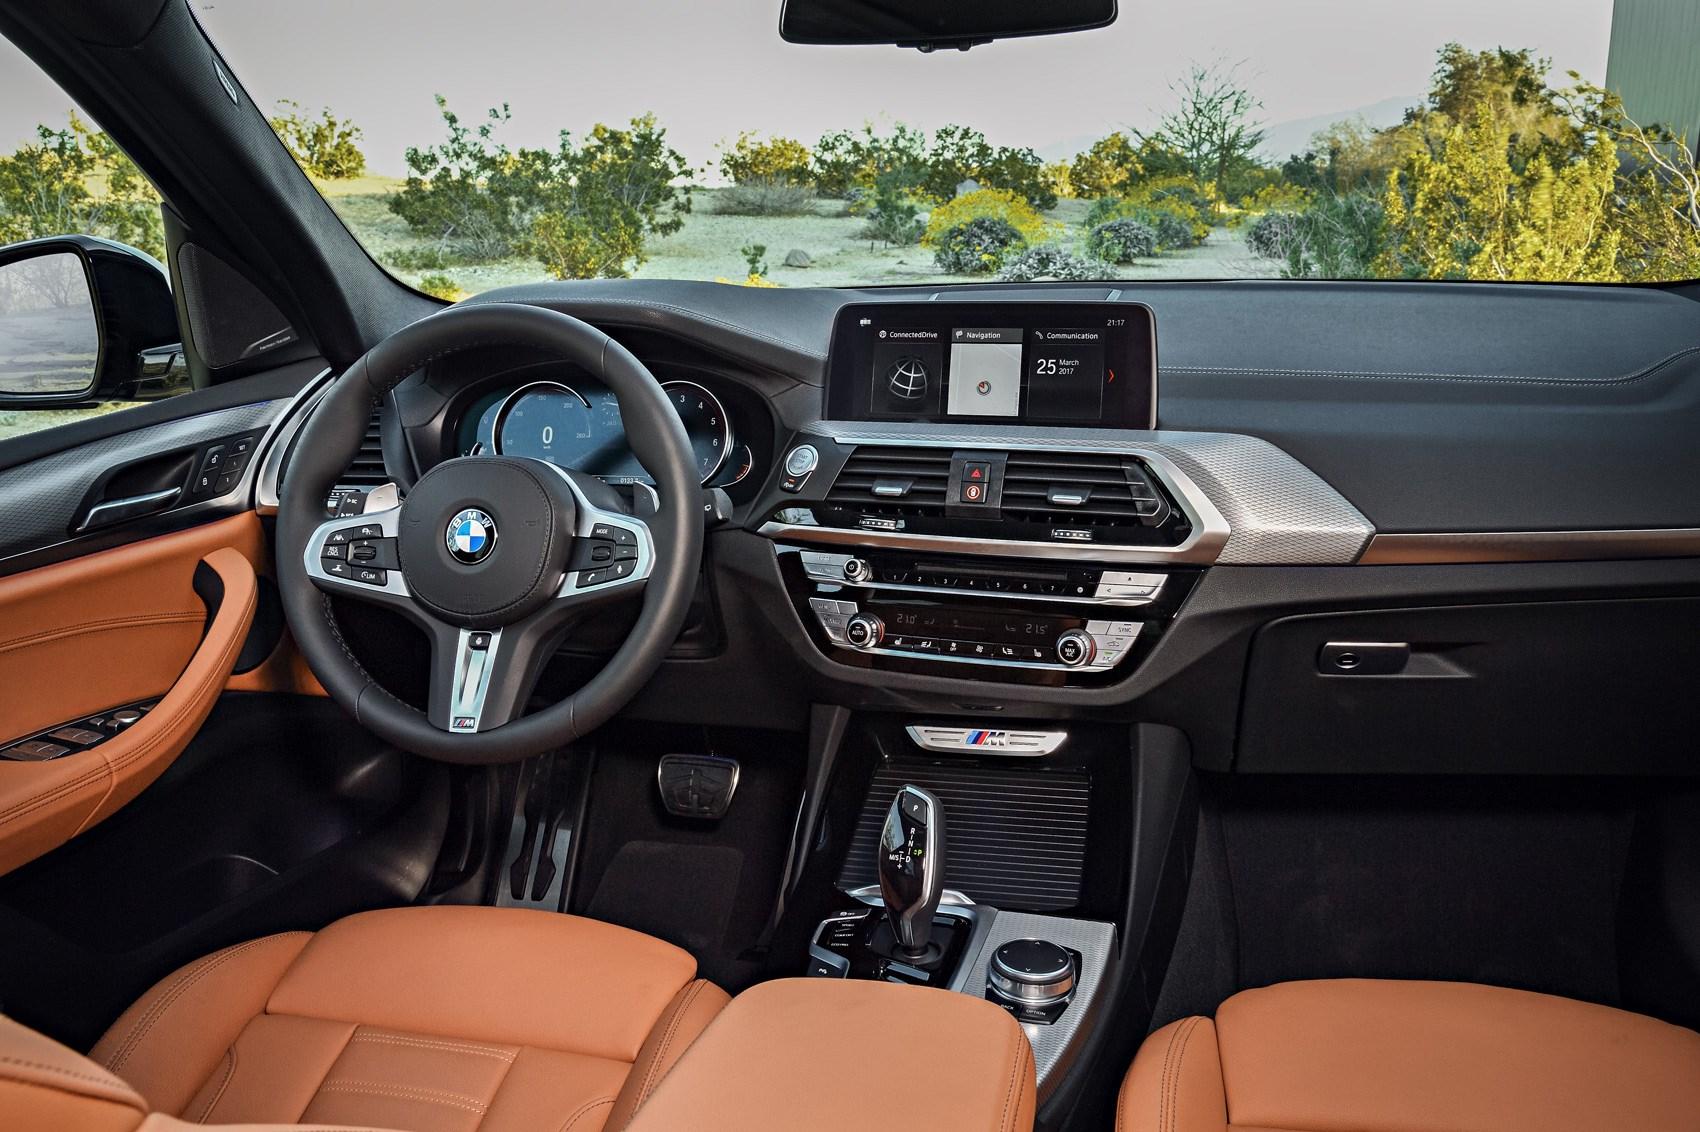 Superior ... New BMW X3 SUV Revealed: Munichu0027s Photocopier Is Working ...